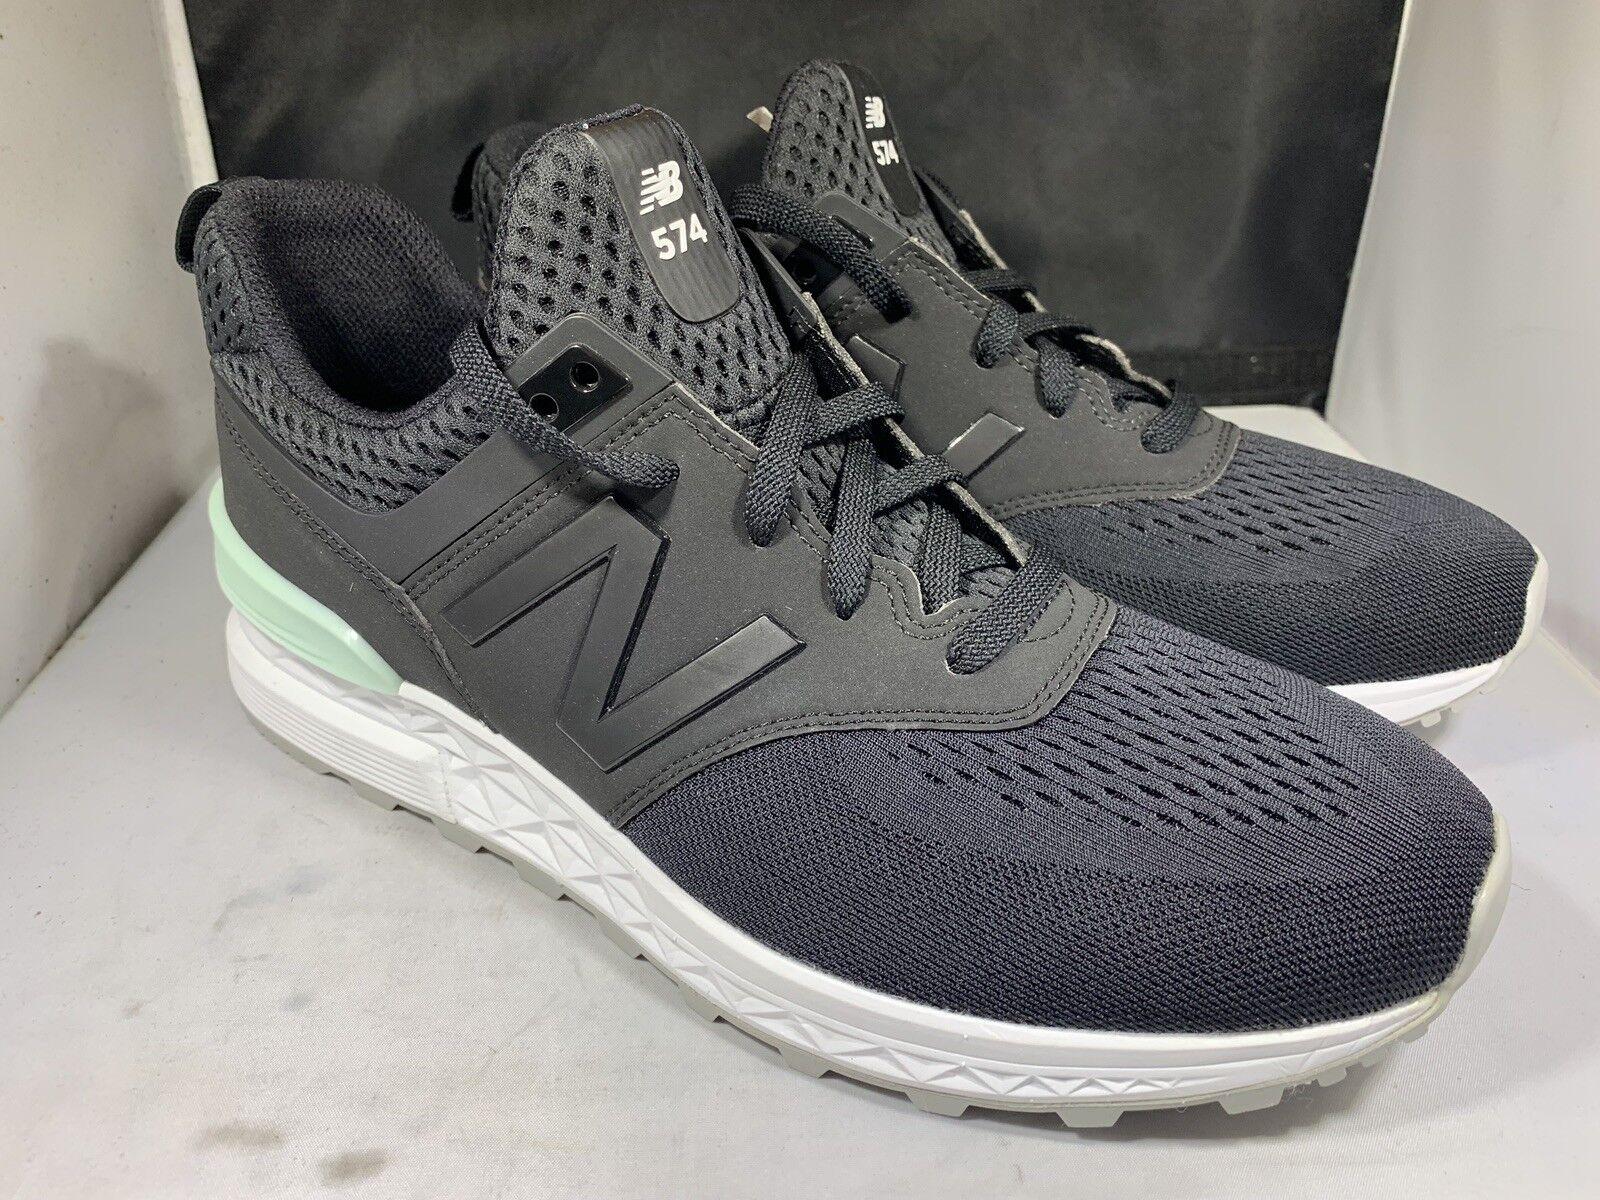 New Balance Men's MS574TMB black and white tennis shoes size 9.5d (nb45)